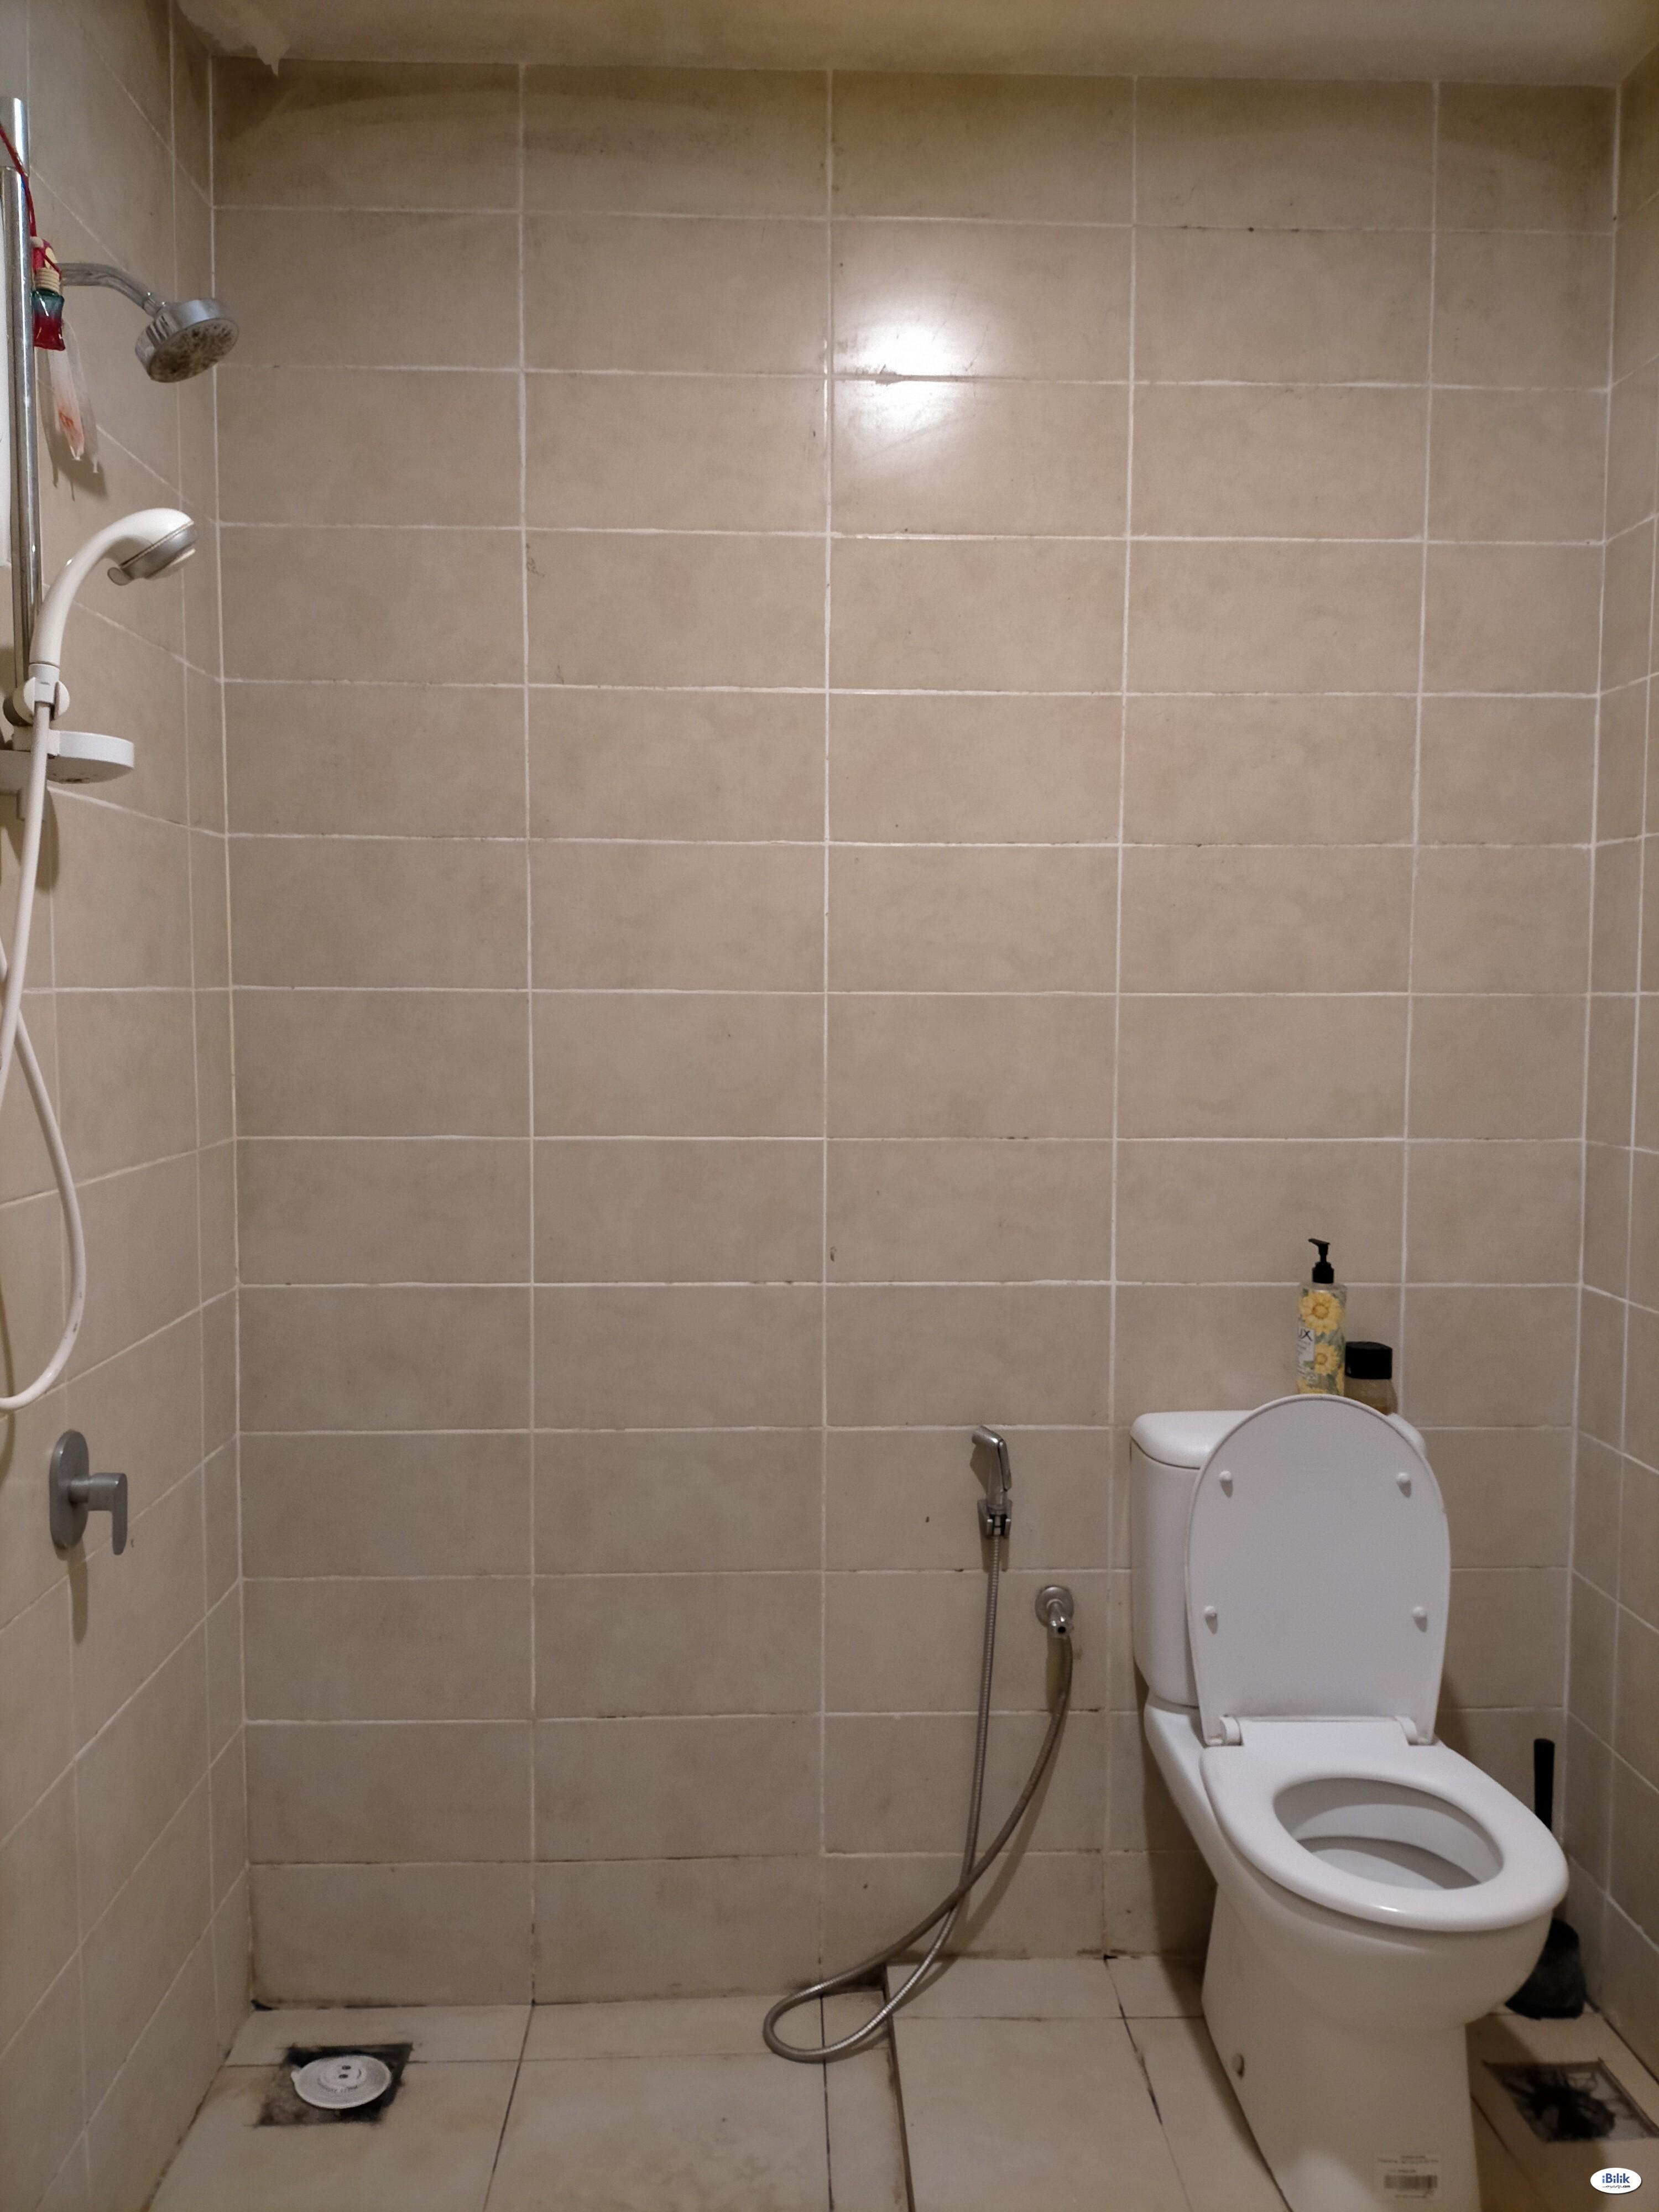 Fully Furnished Small Room i-City Shah Alam Seksyen 7 UiTM Petaling Jaya Klang i-Residence Condominium (Wt Utility)